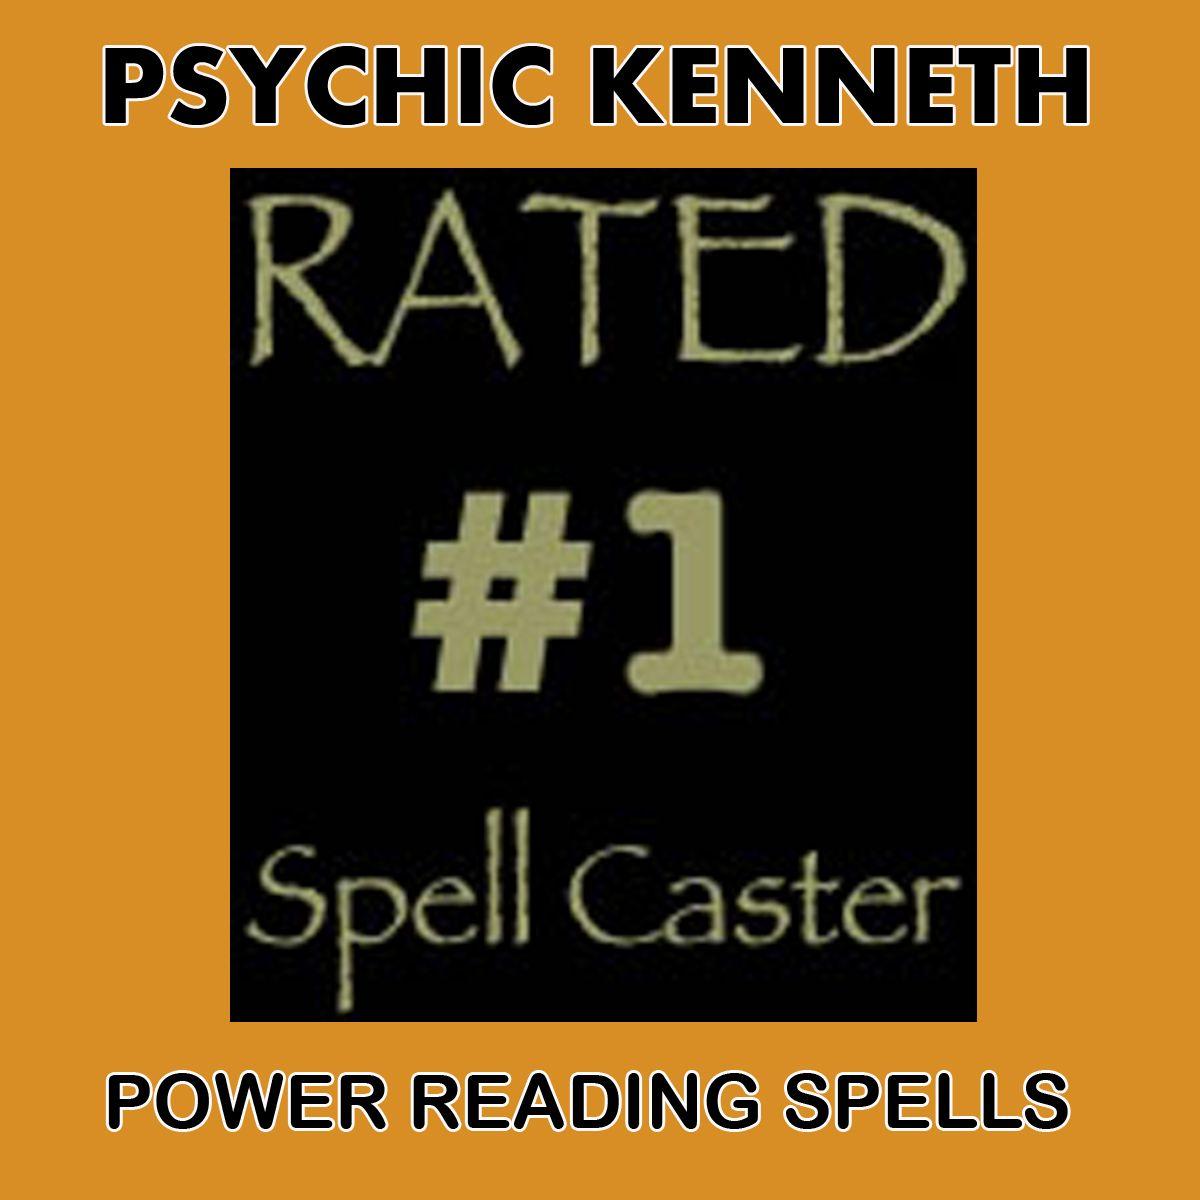 #1 Ranked Accurate Psychic Reader, Spell Caster   Reiki Psychic, Holistic Healer Kenneth, WhatsApp: +27843769238  E-mail: psychicreading8@gmail.com   http://healer-kenneth.branded.me   https://twitter.com/healerkenneth   http://healerkenneth.blogspot.com/   https://www.pinterest.com/accurater/   https://www.facebook.com/psychickenneth   https://www.pinterest.com/psychickenneth/   https://plus.google.com/103174431634678683238  https://za.linkedin.com/pub/wamba-kenneth/100/4b3/705